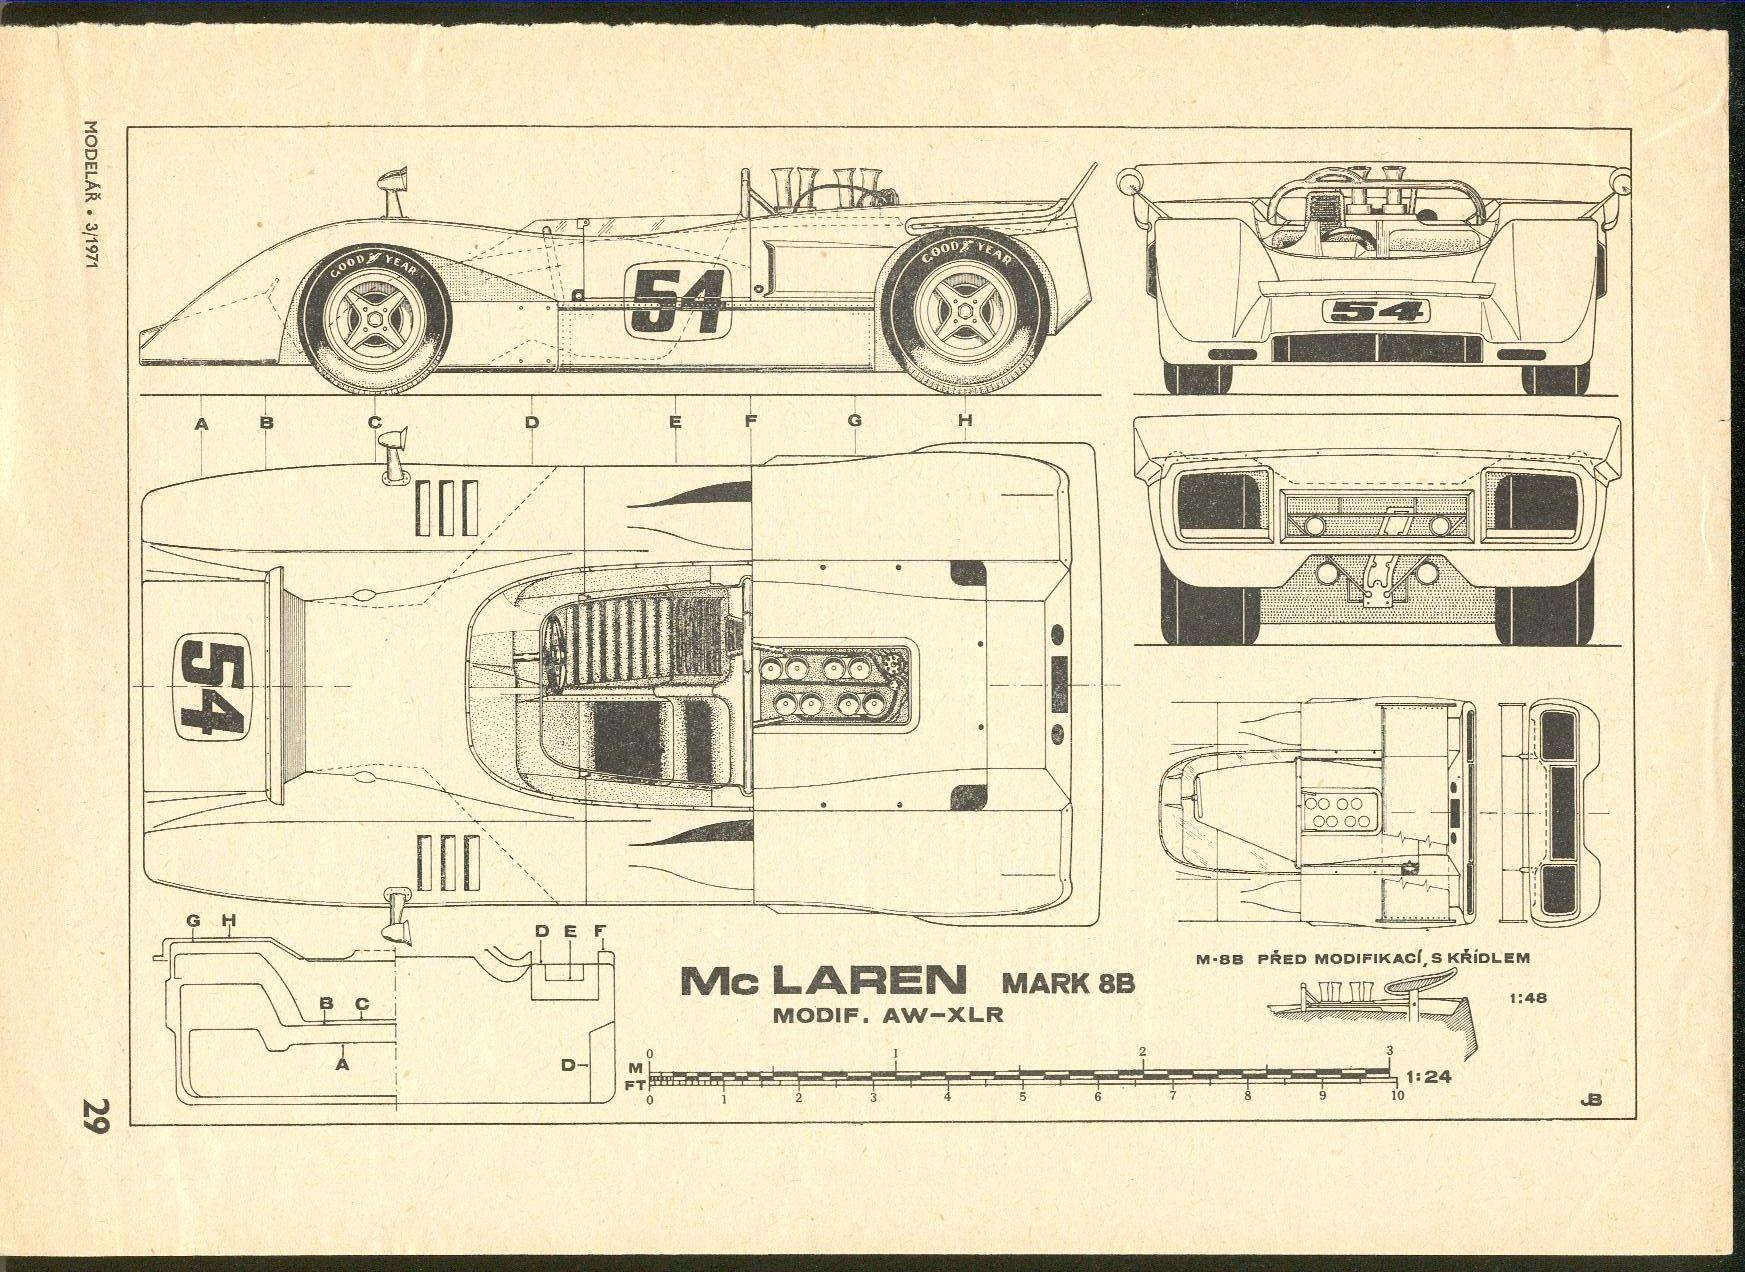 mclaren mk 8b smcars net car blueprints forum blueprint drawing mclaren f1 [ 1745 x 1272 Pixel ]